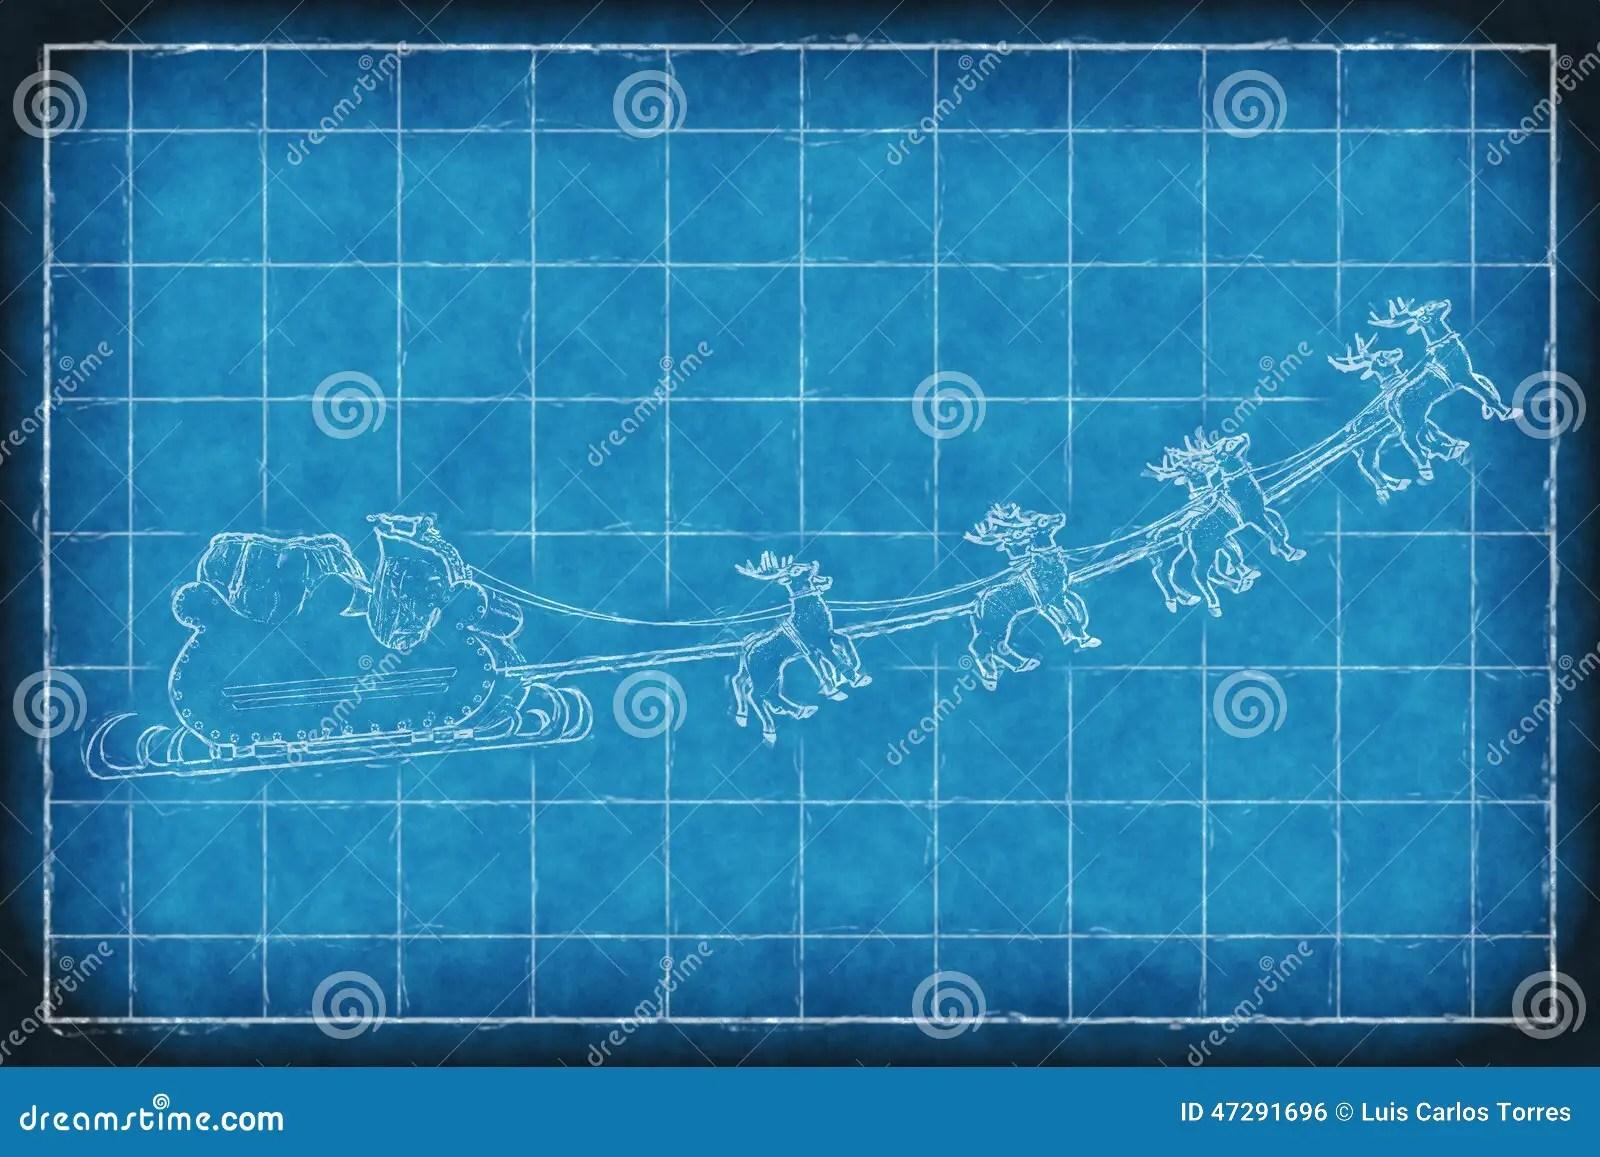 Blueprint Santa Claus Sleight Stock Photo Image 47291696